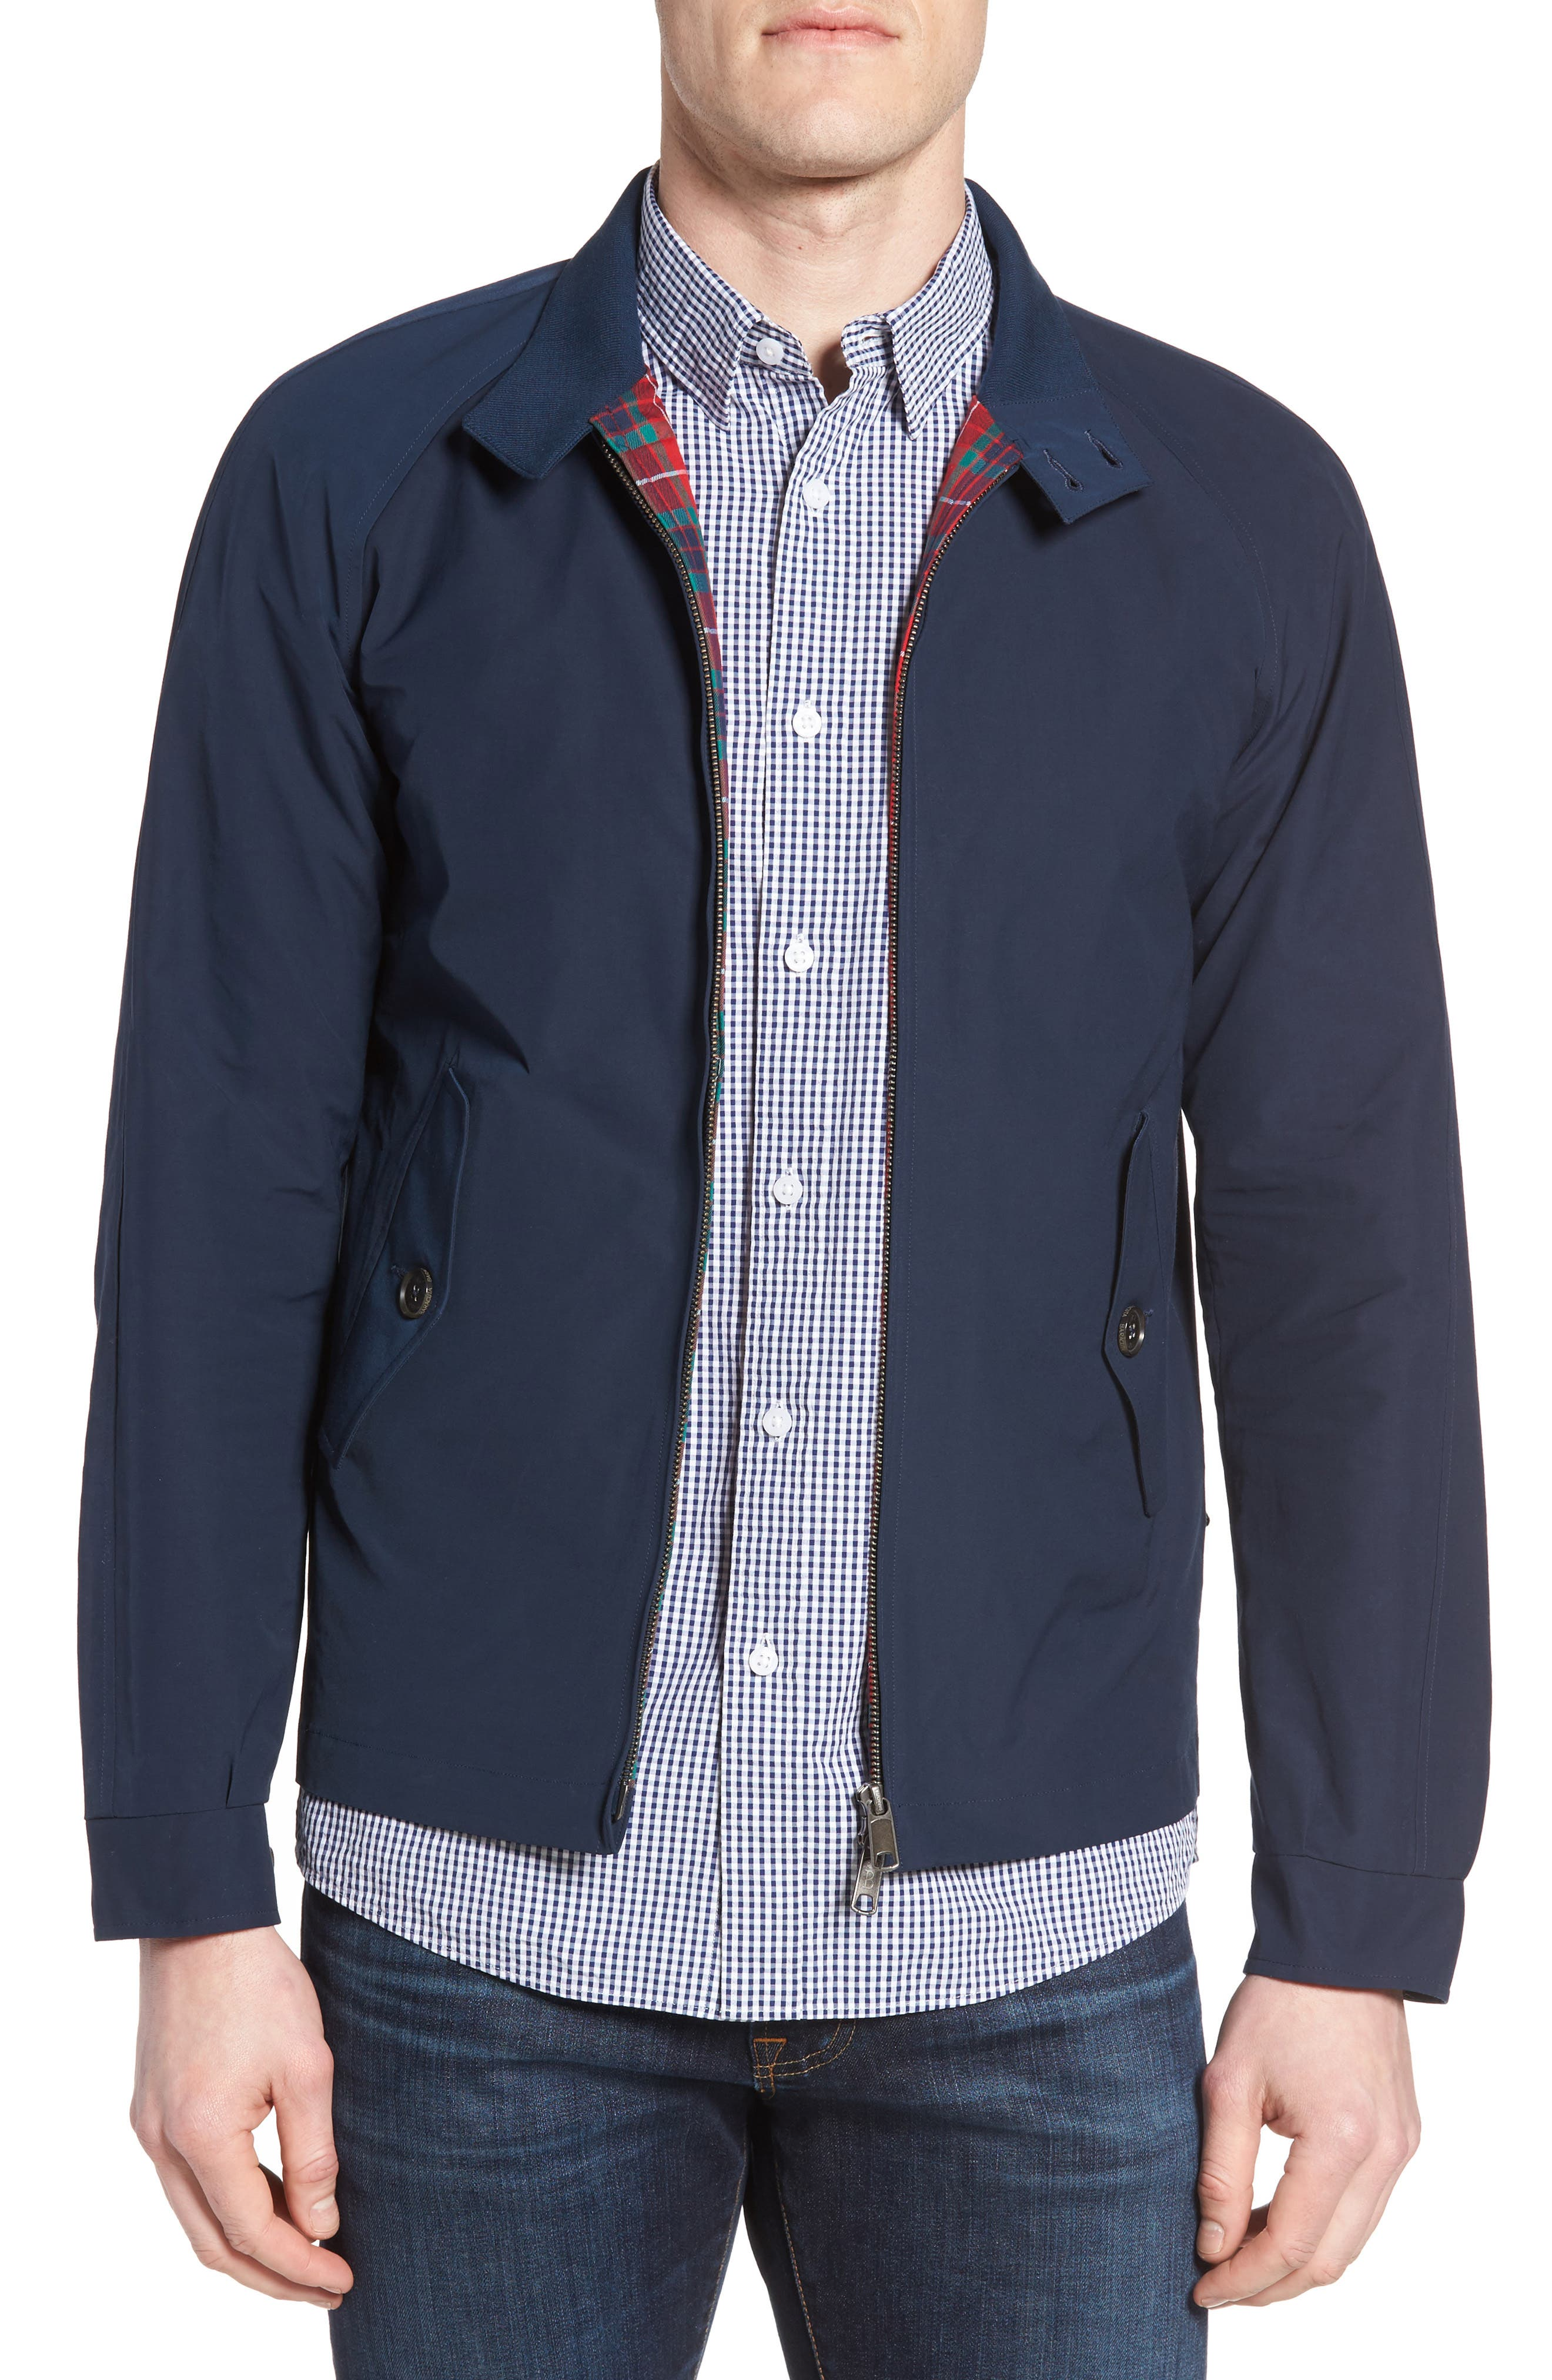 G4 Water Repellent Harrington Jacket,                             Main thumbnail 1, color,                             Navy